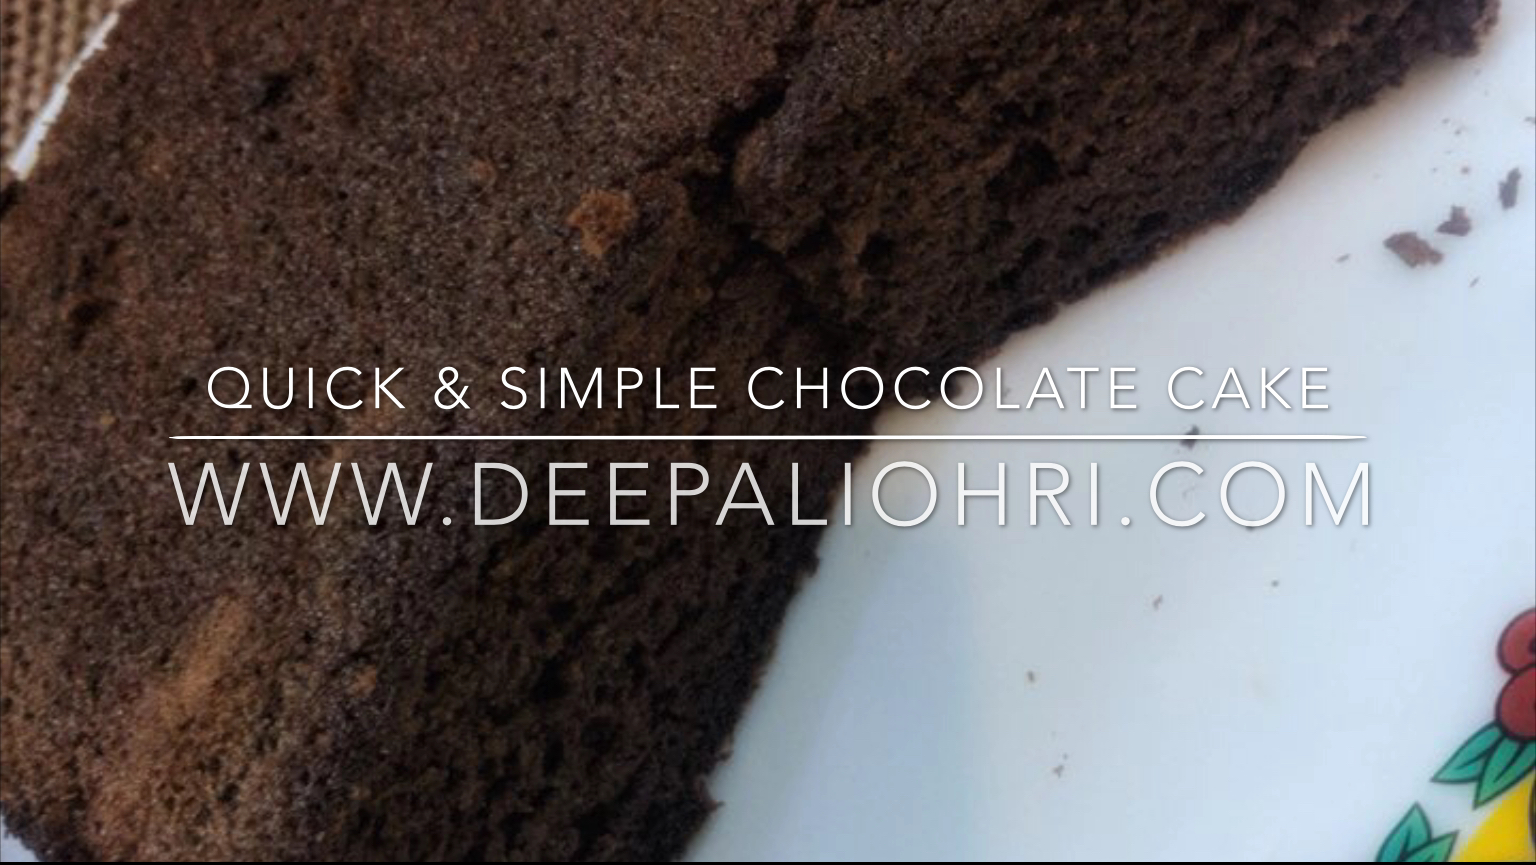 Quick Easy Chocolate Cake Recipe Deepali Ohri